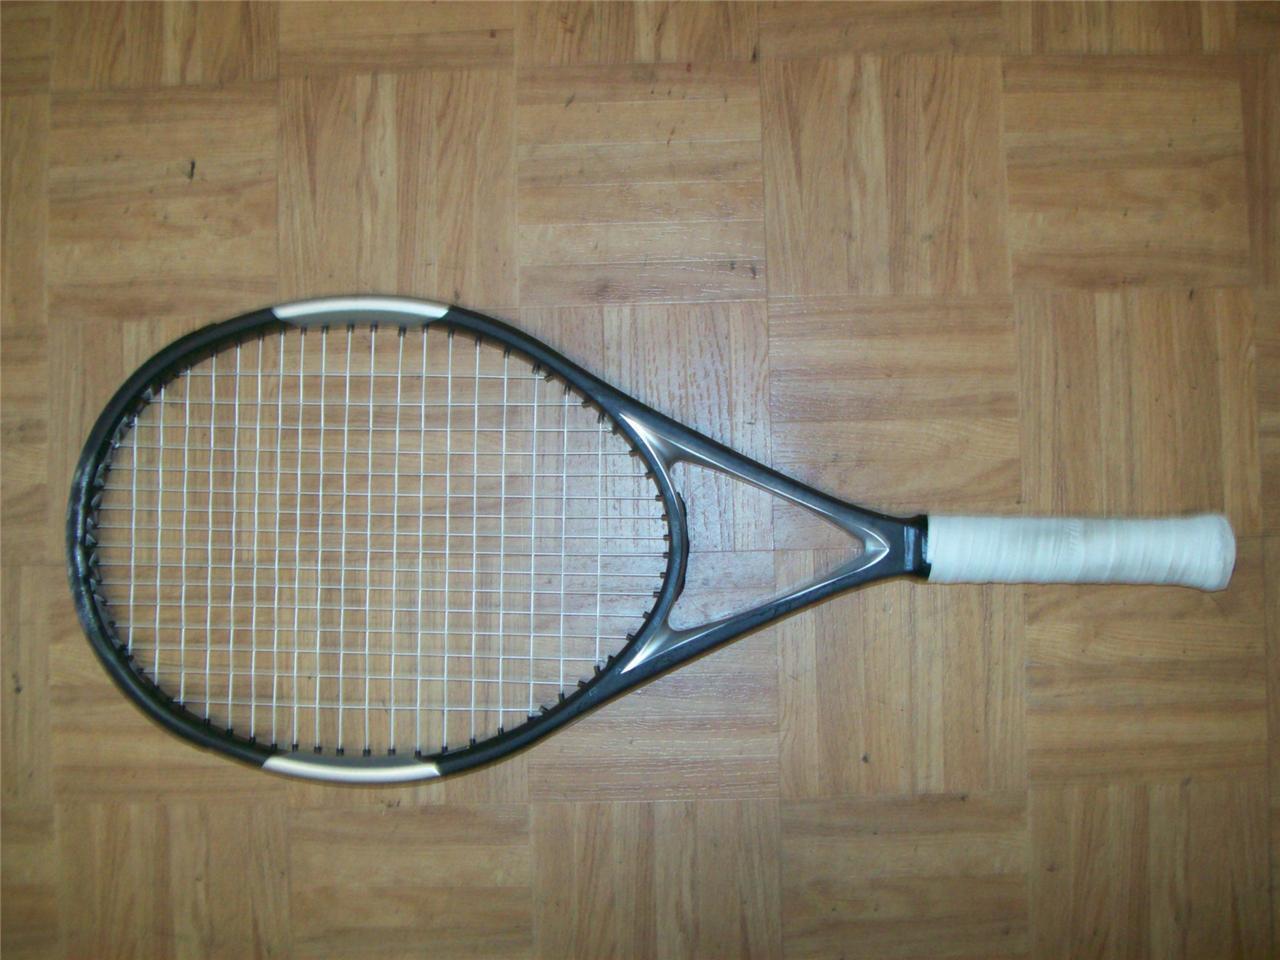 Wilson Oversize Hammer H 2 Oversize Wilson 4 5/8 Grip Tenis Raqueta a3f023